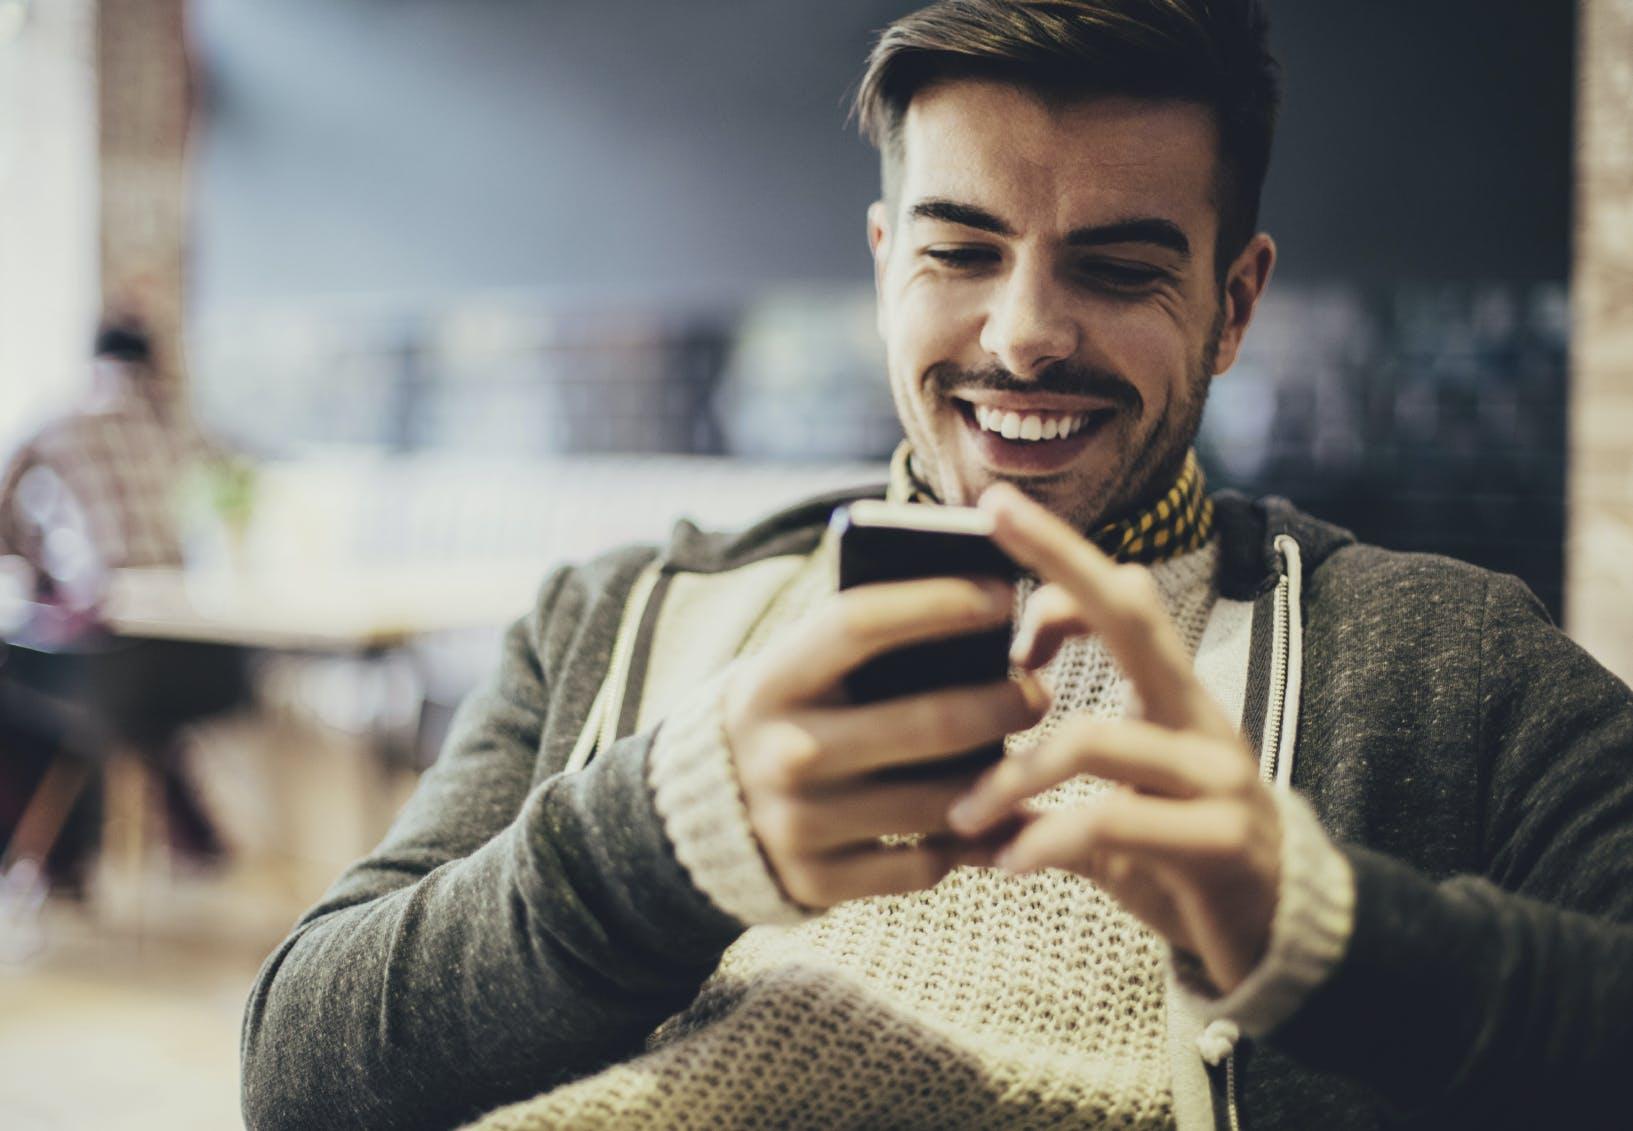 Das perfekte online dating profil beispiel - Search for marriage